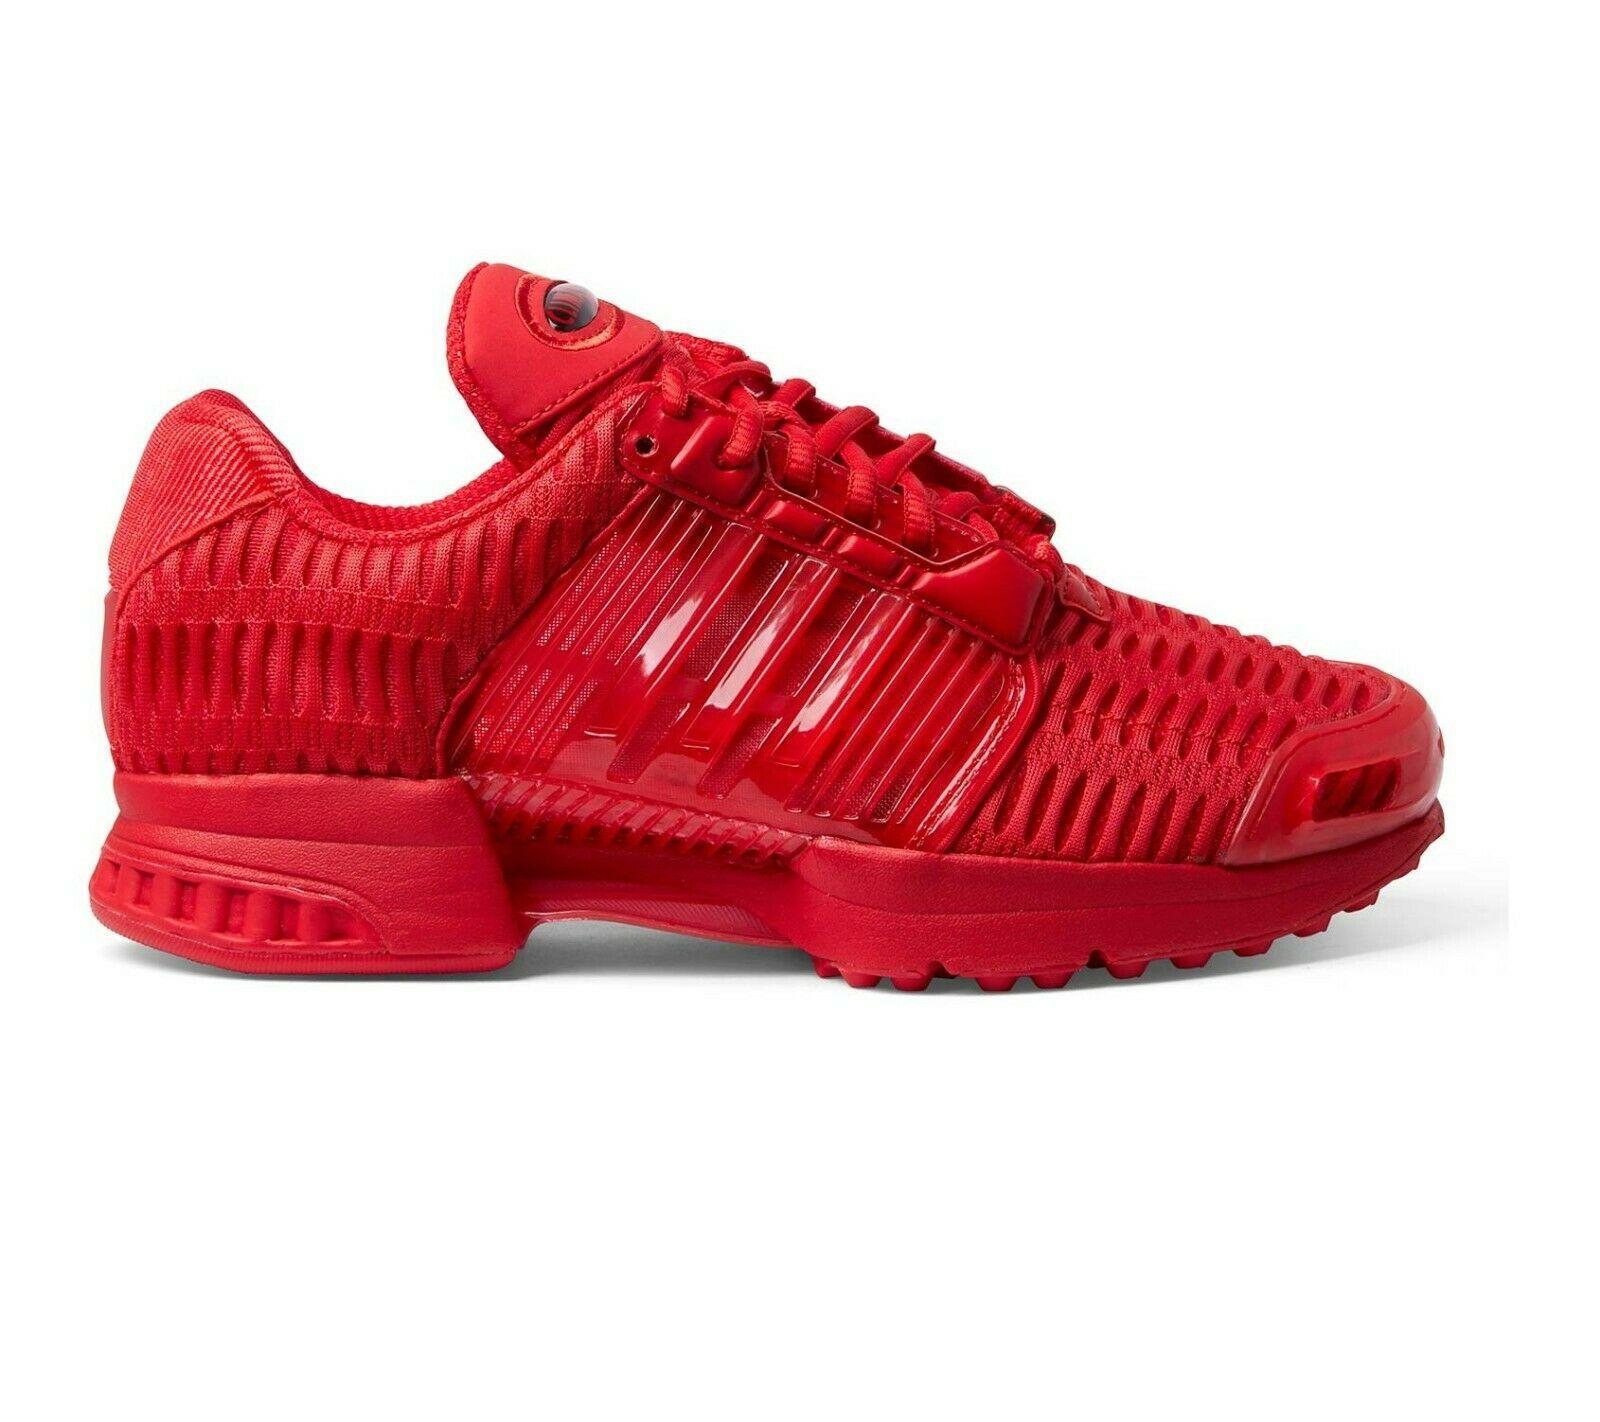 Adidas Originals Clima Cool 1 Triple Red Collegiate BA8581 Mens Size 10